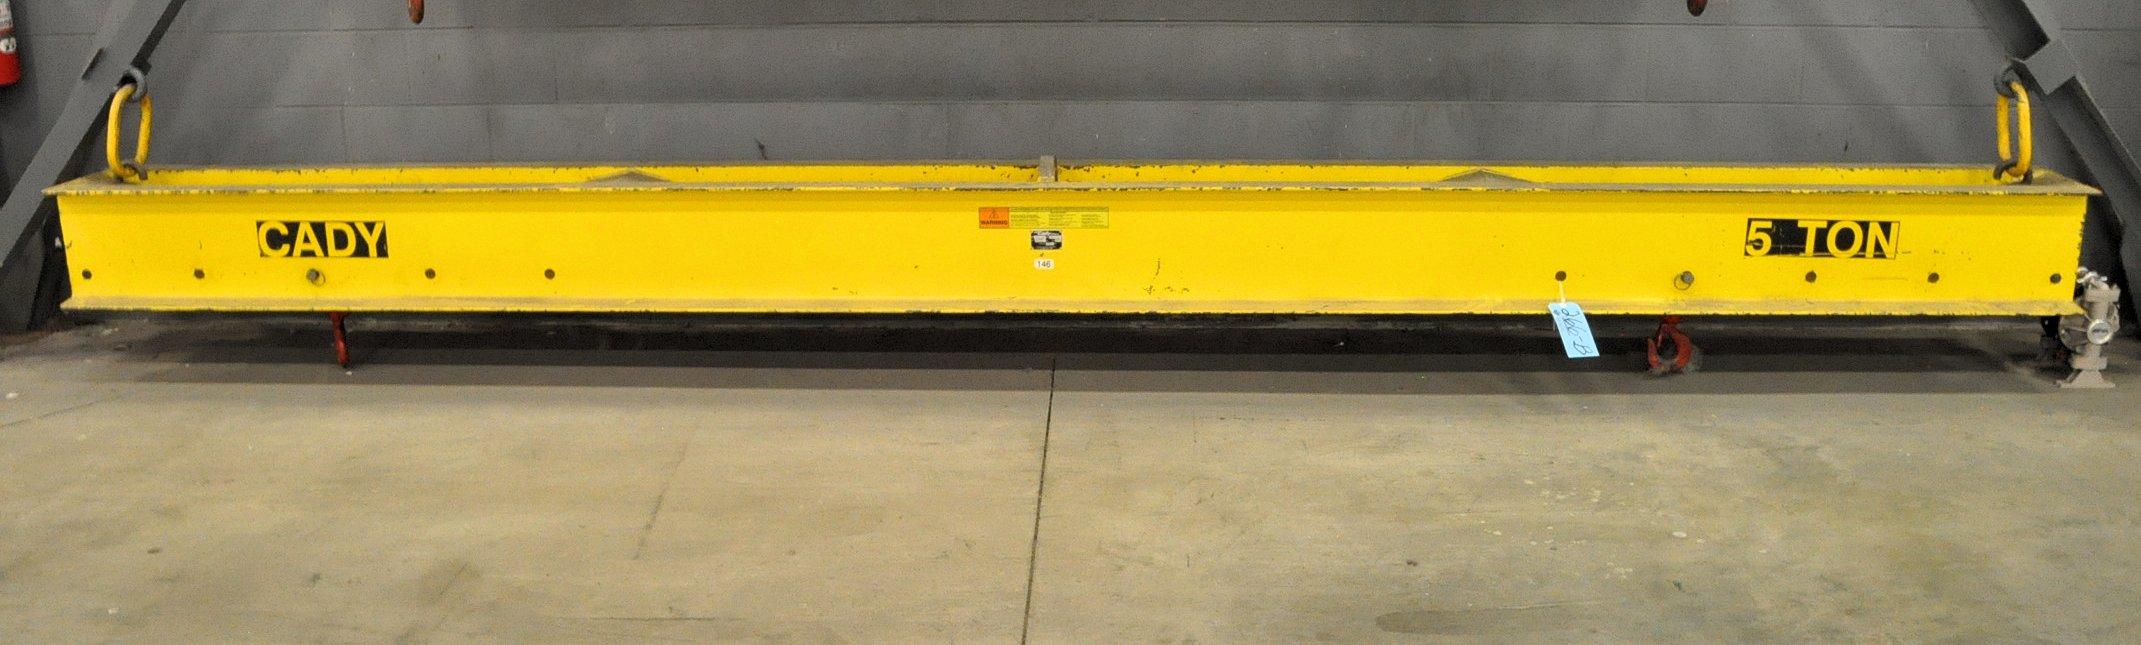 "Cady Model A10-16, 5-Ton Capacity x 196"" Long, 2-Point Crane"